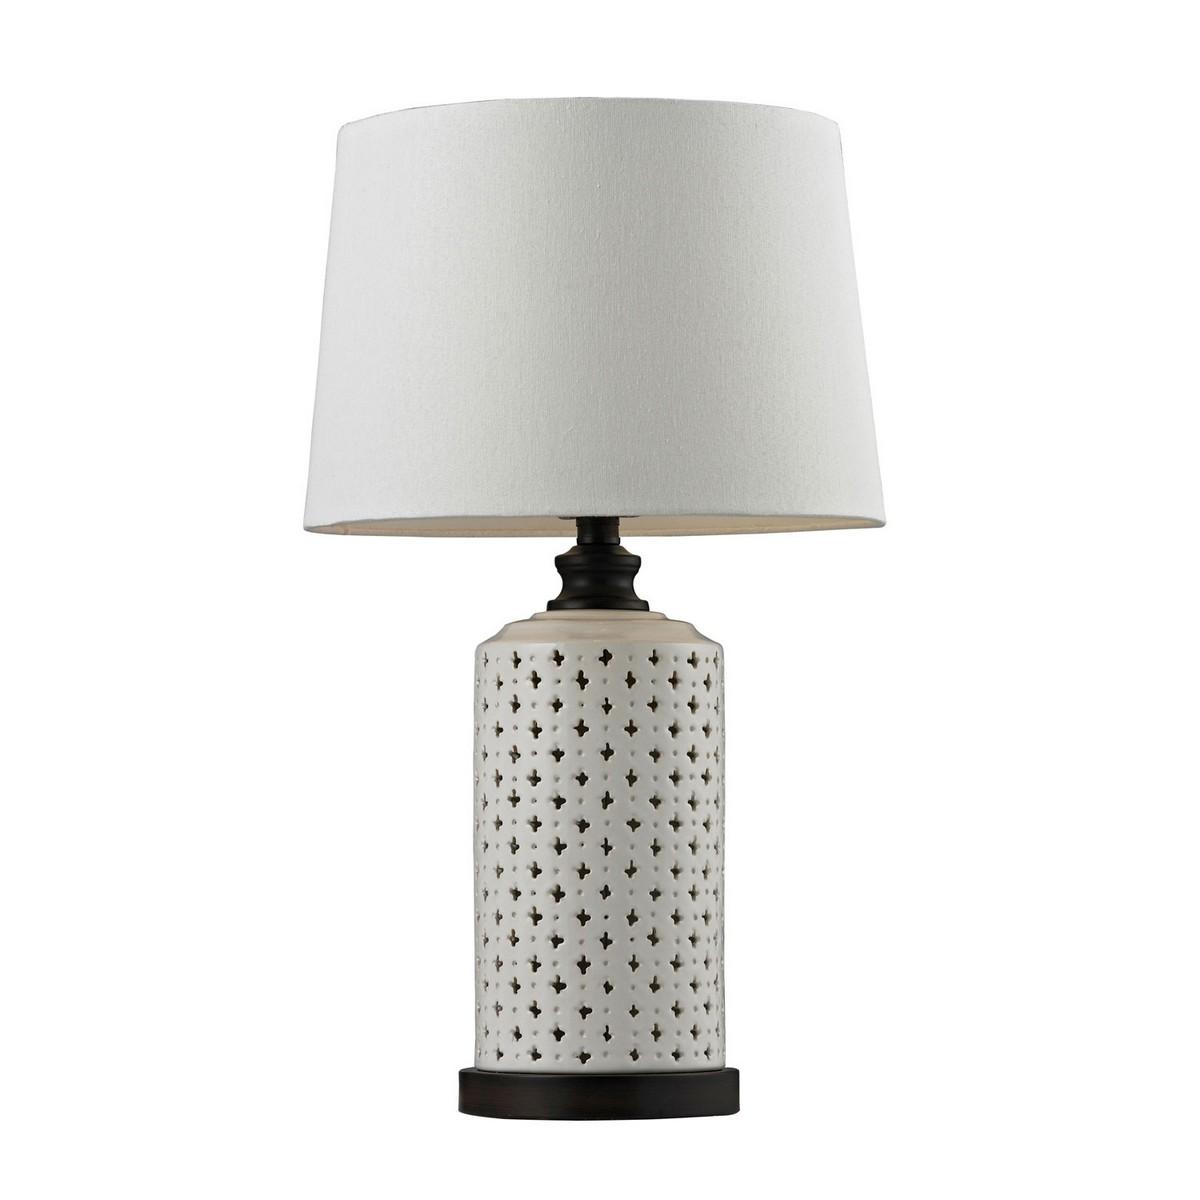 Elk Lighting D128 Table Lamp - Cream Glazeand Dark Brown Paint